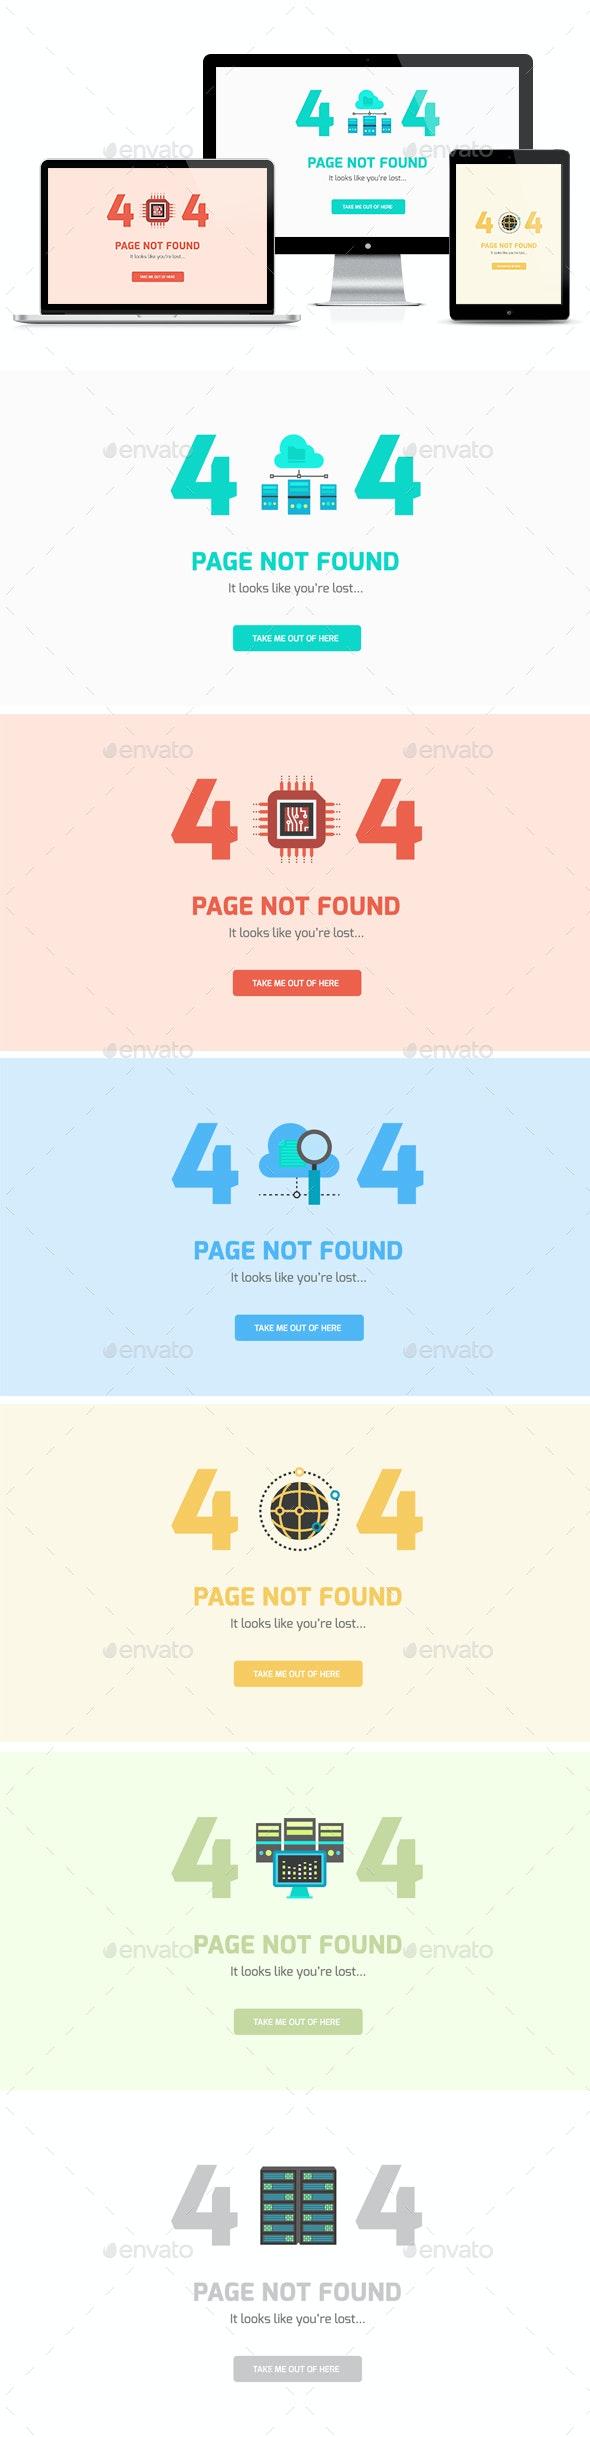 404 Error Webpages - Flat UI Design - 6 items - PSD - 404 Pages Web Elements